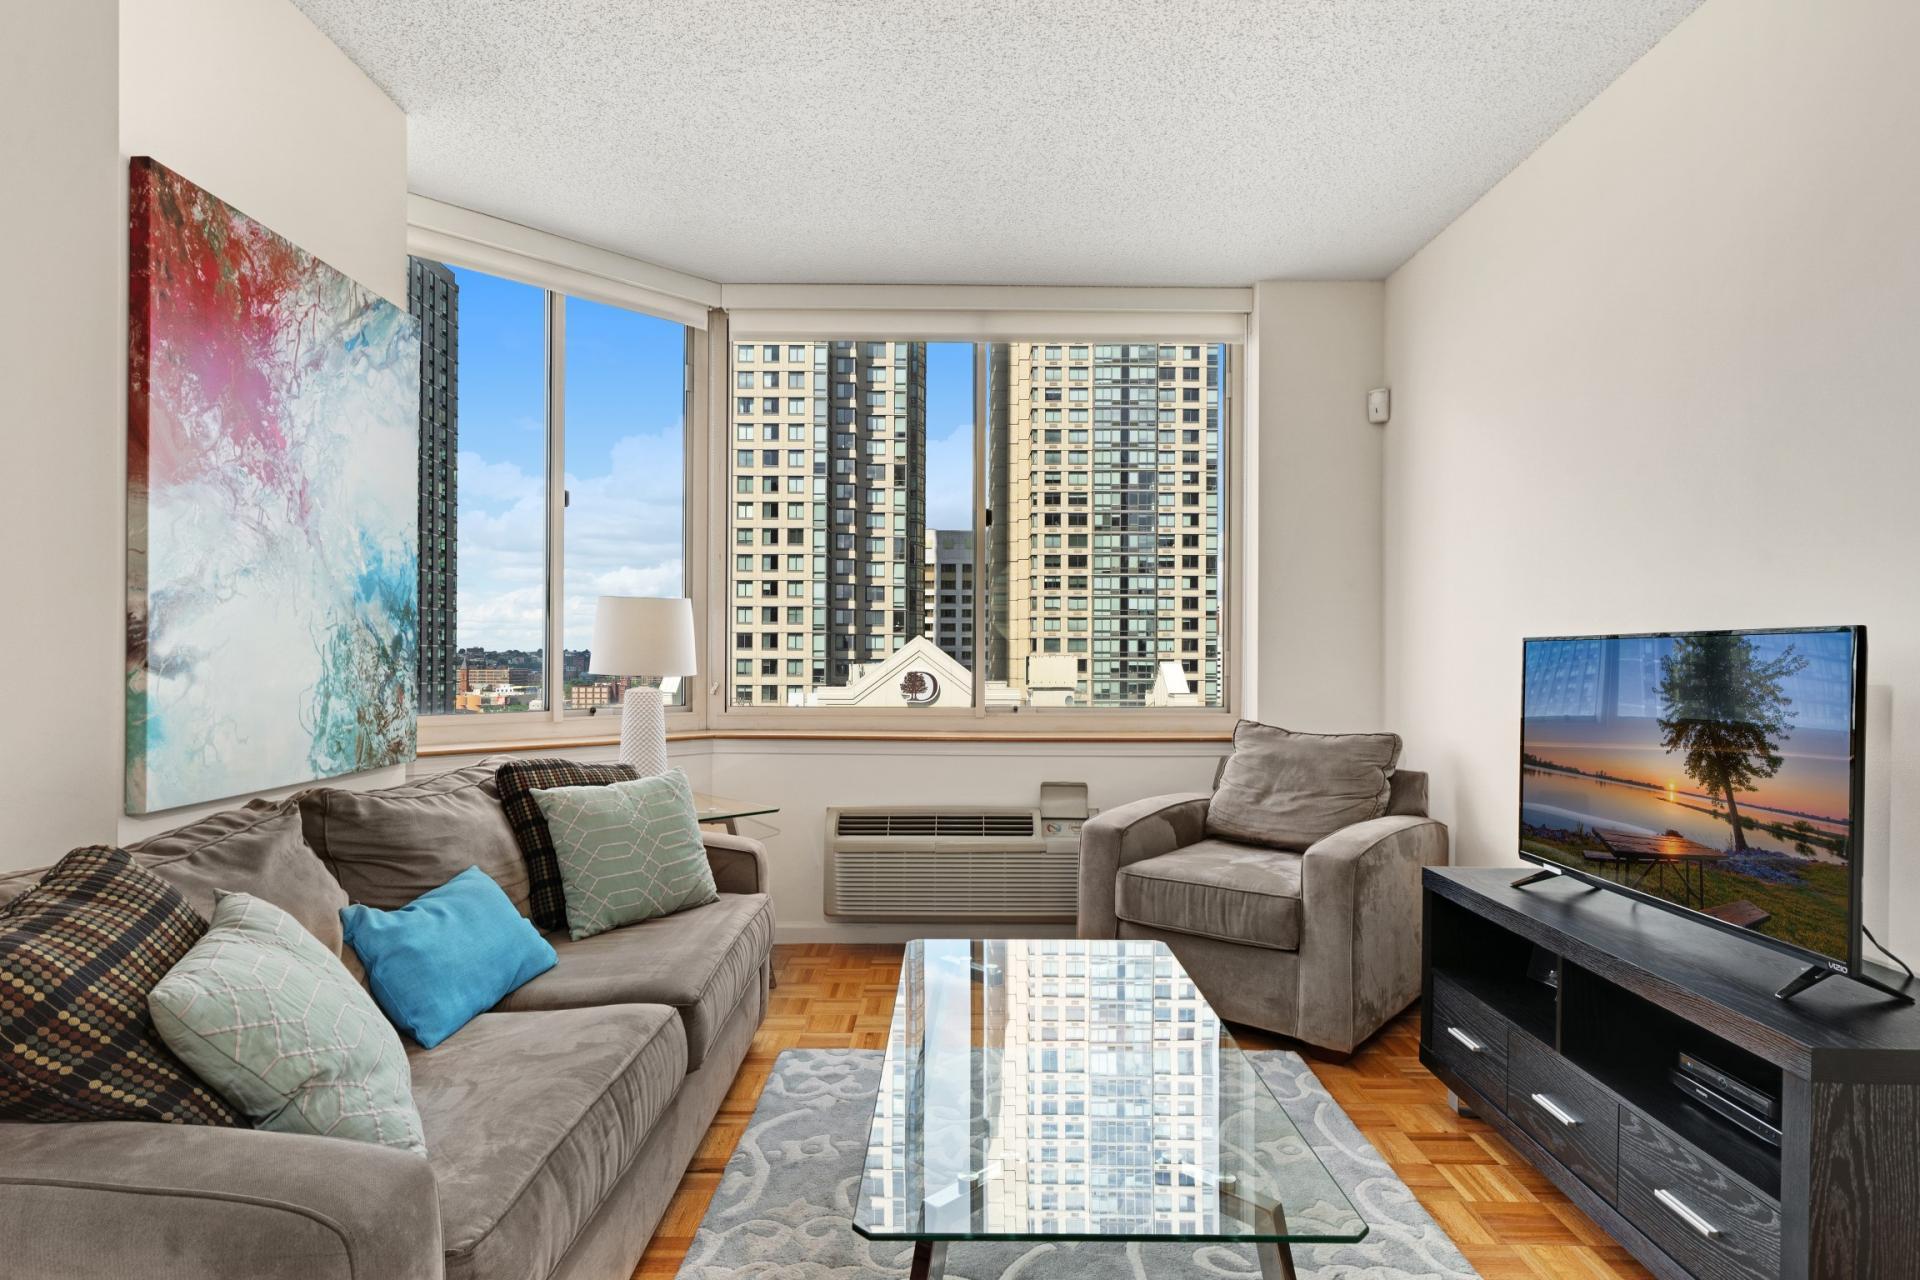 Living room at Marbella Washington Boulevard Apartments, Centre, Jersey City